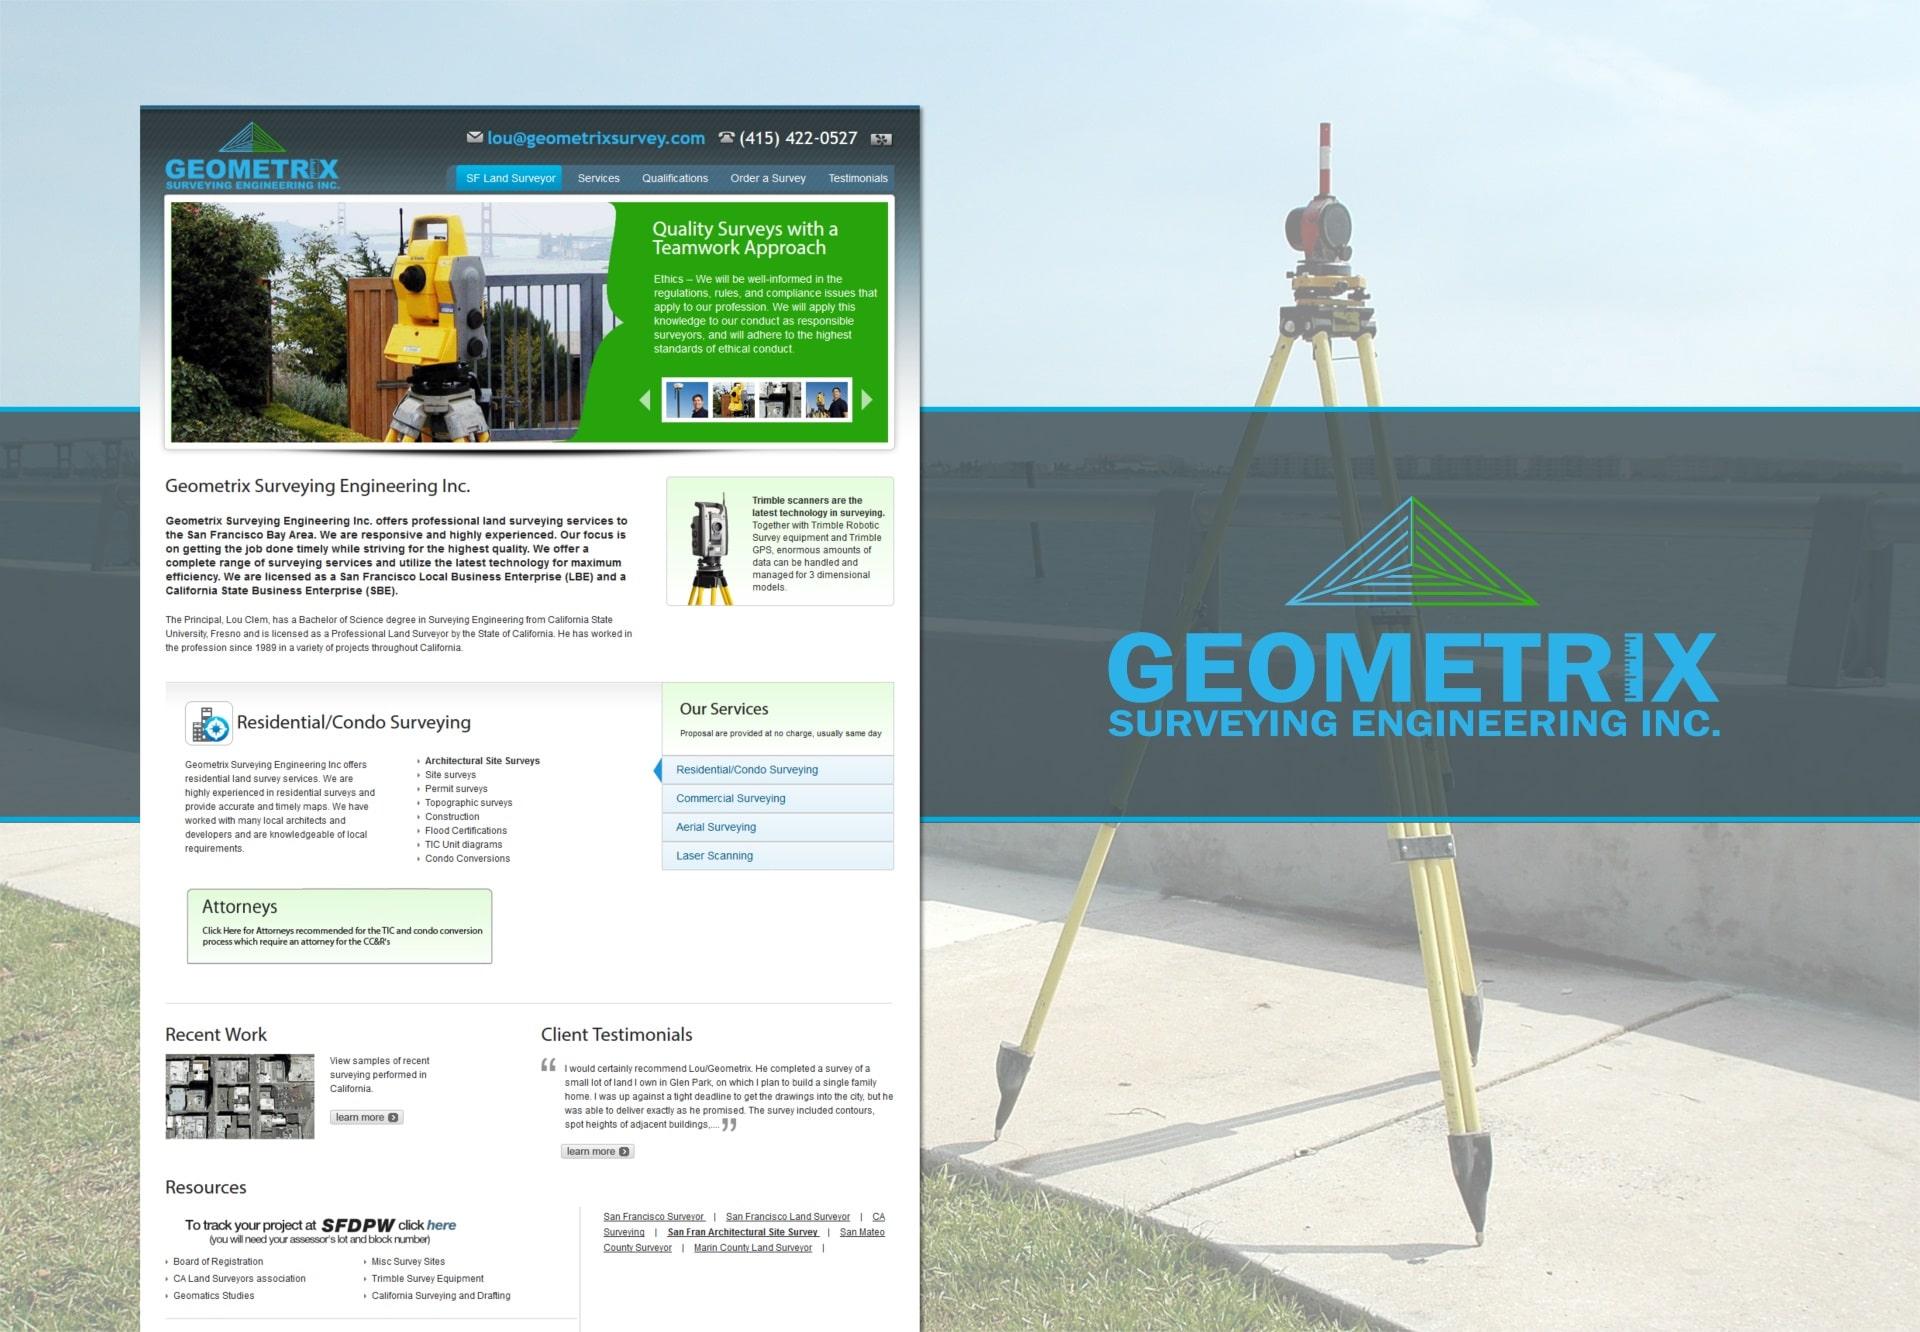 Geometrix Surveying Engineering Inc.